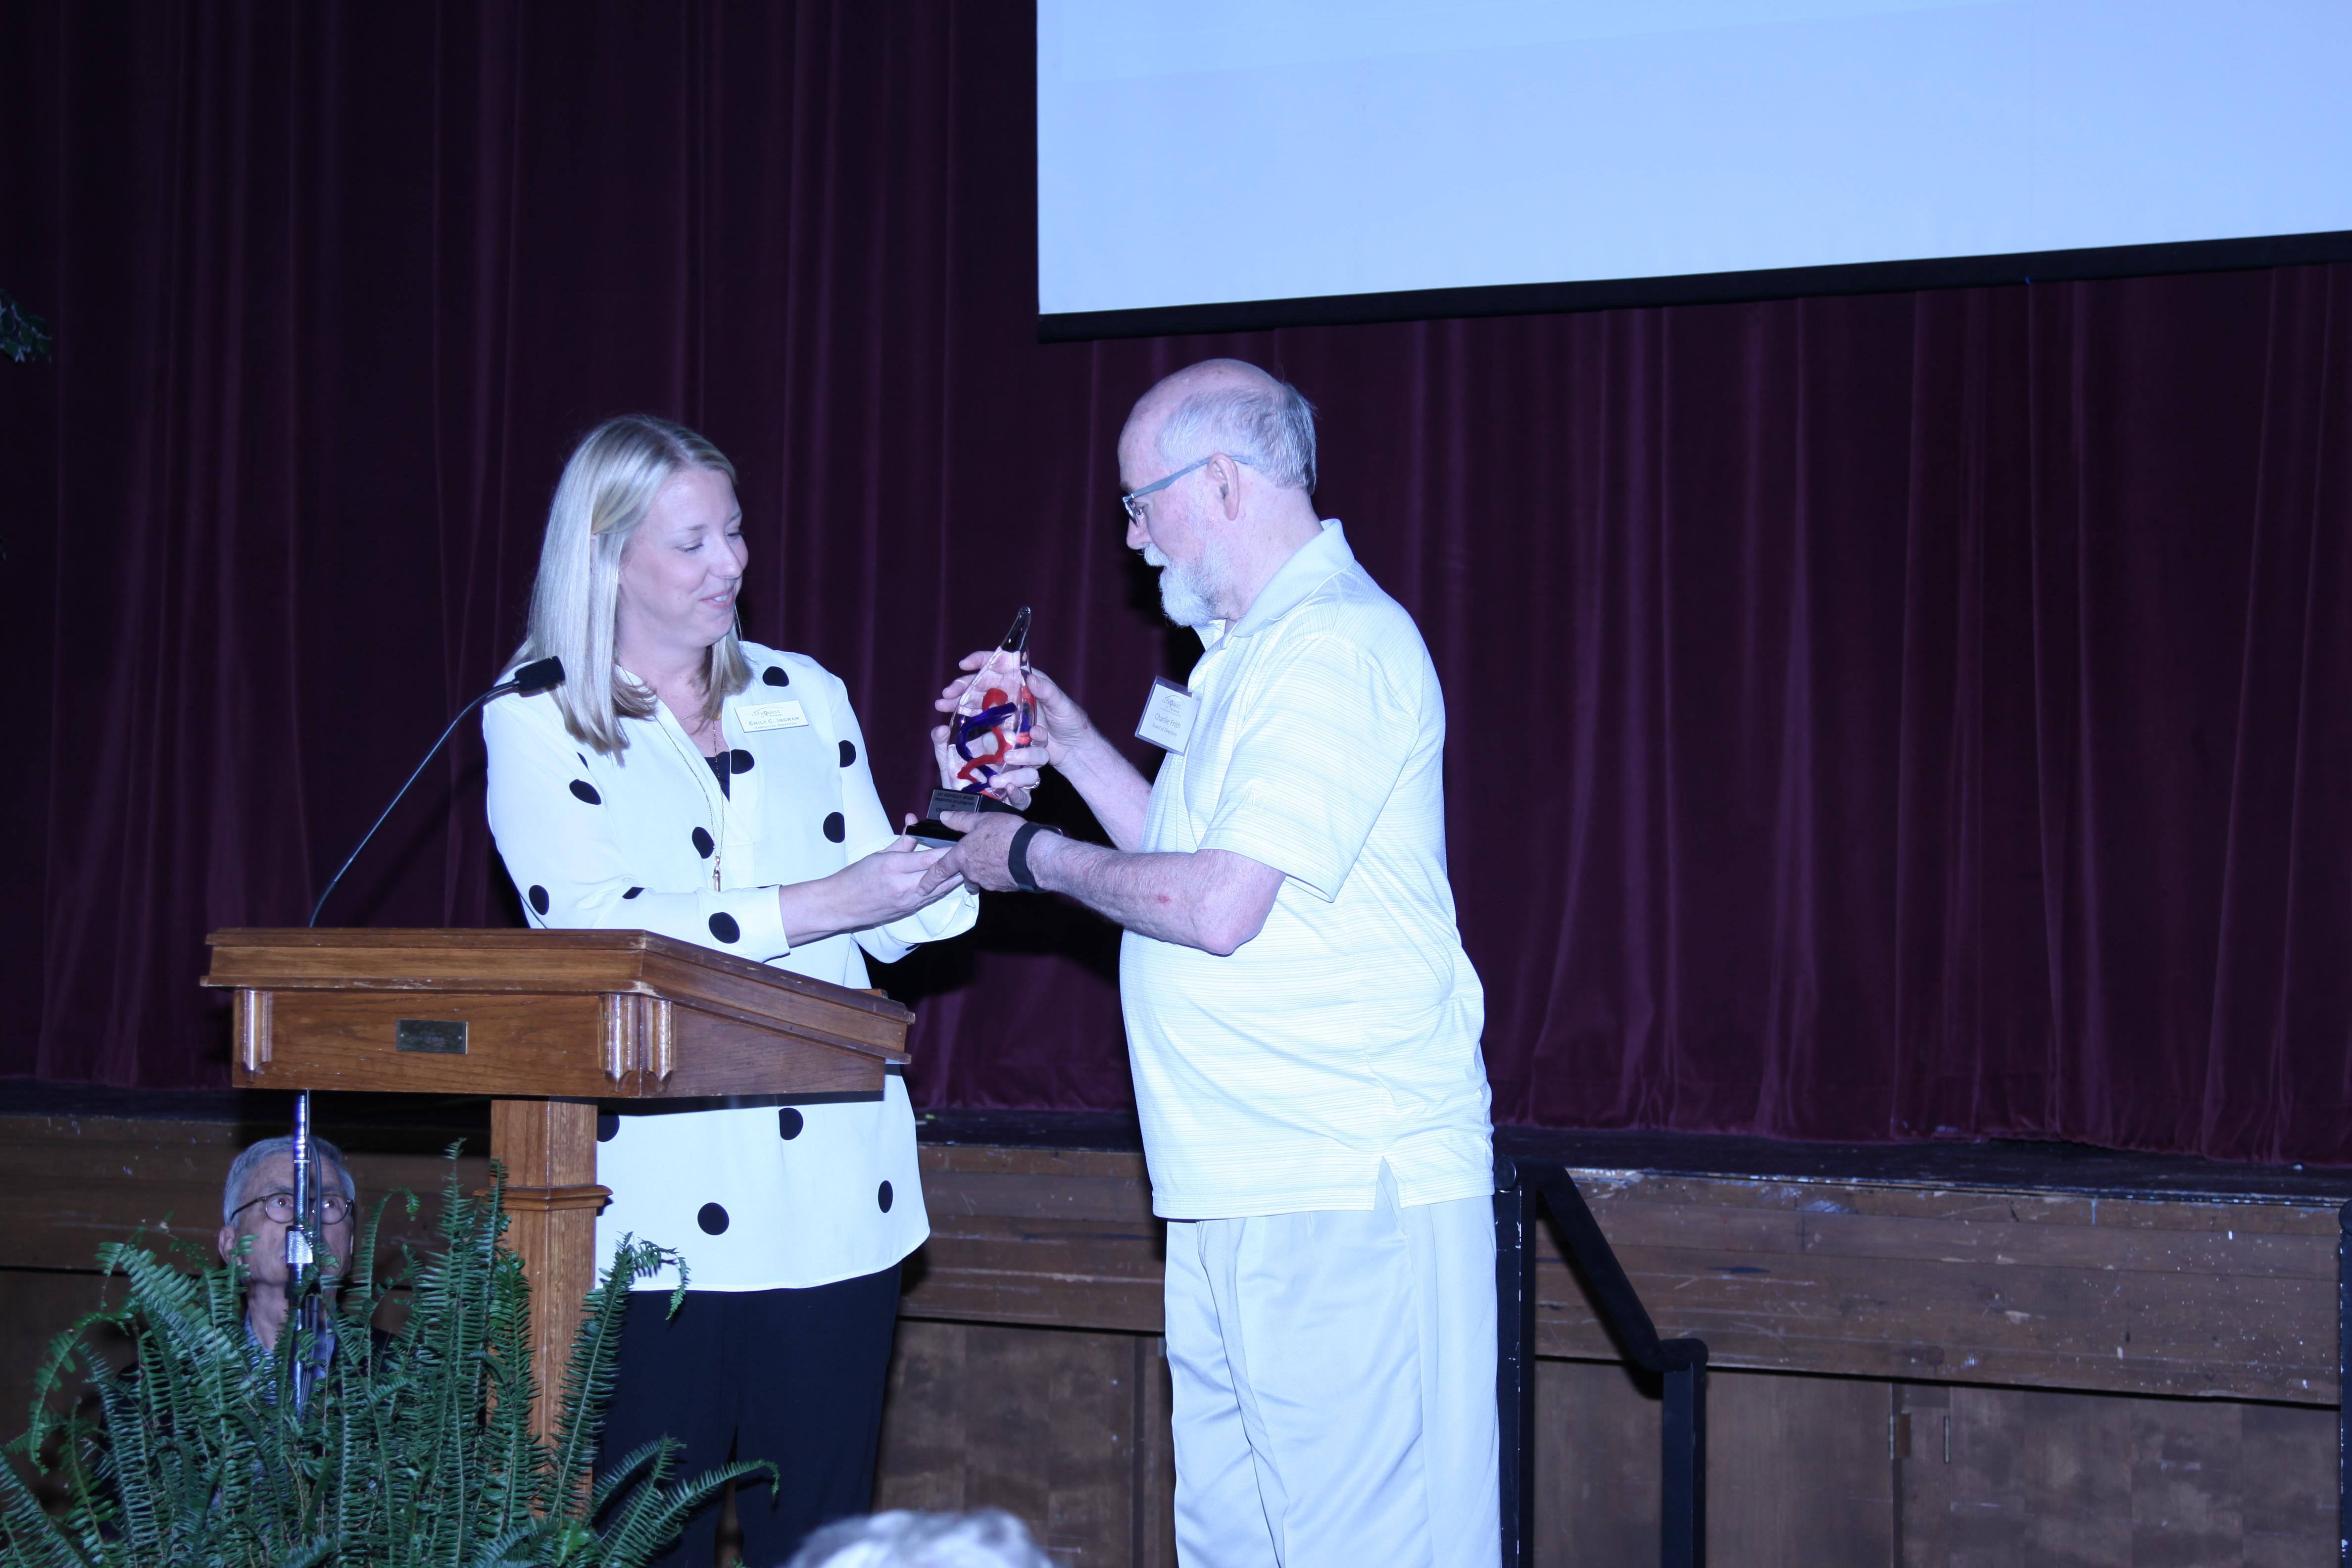 Frith Receives J. Jernigan Award